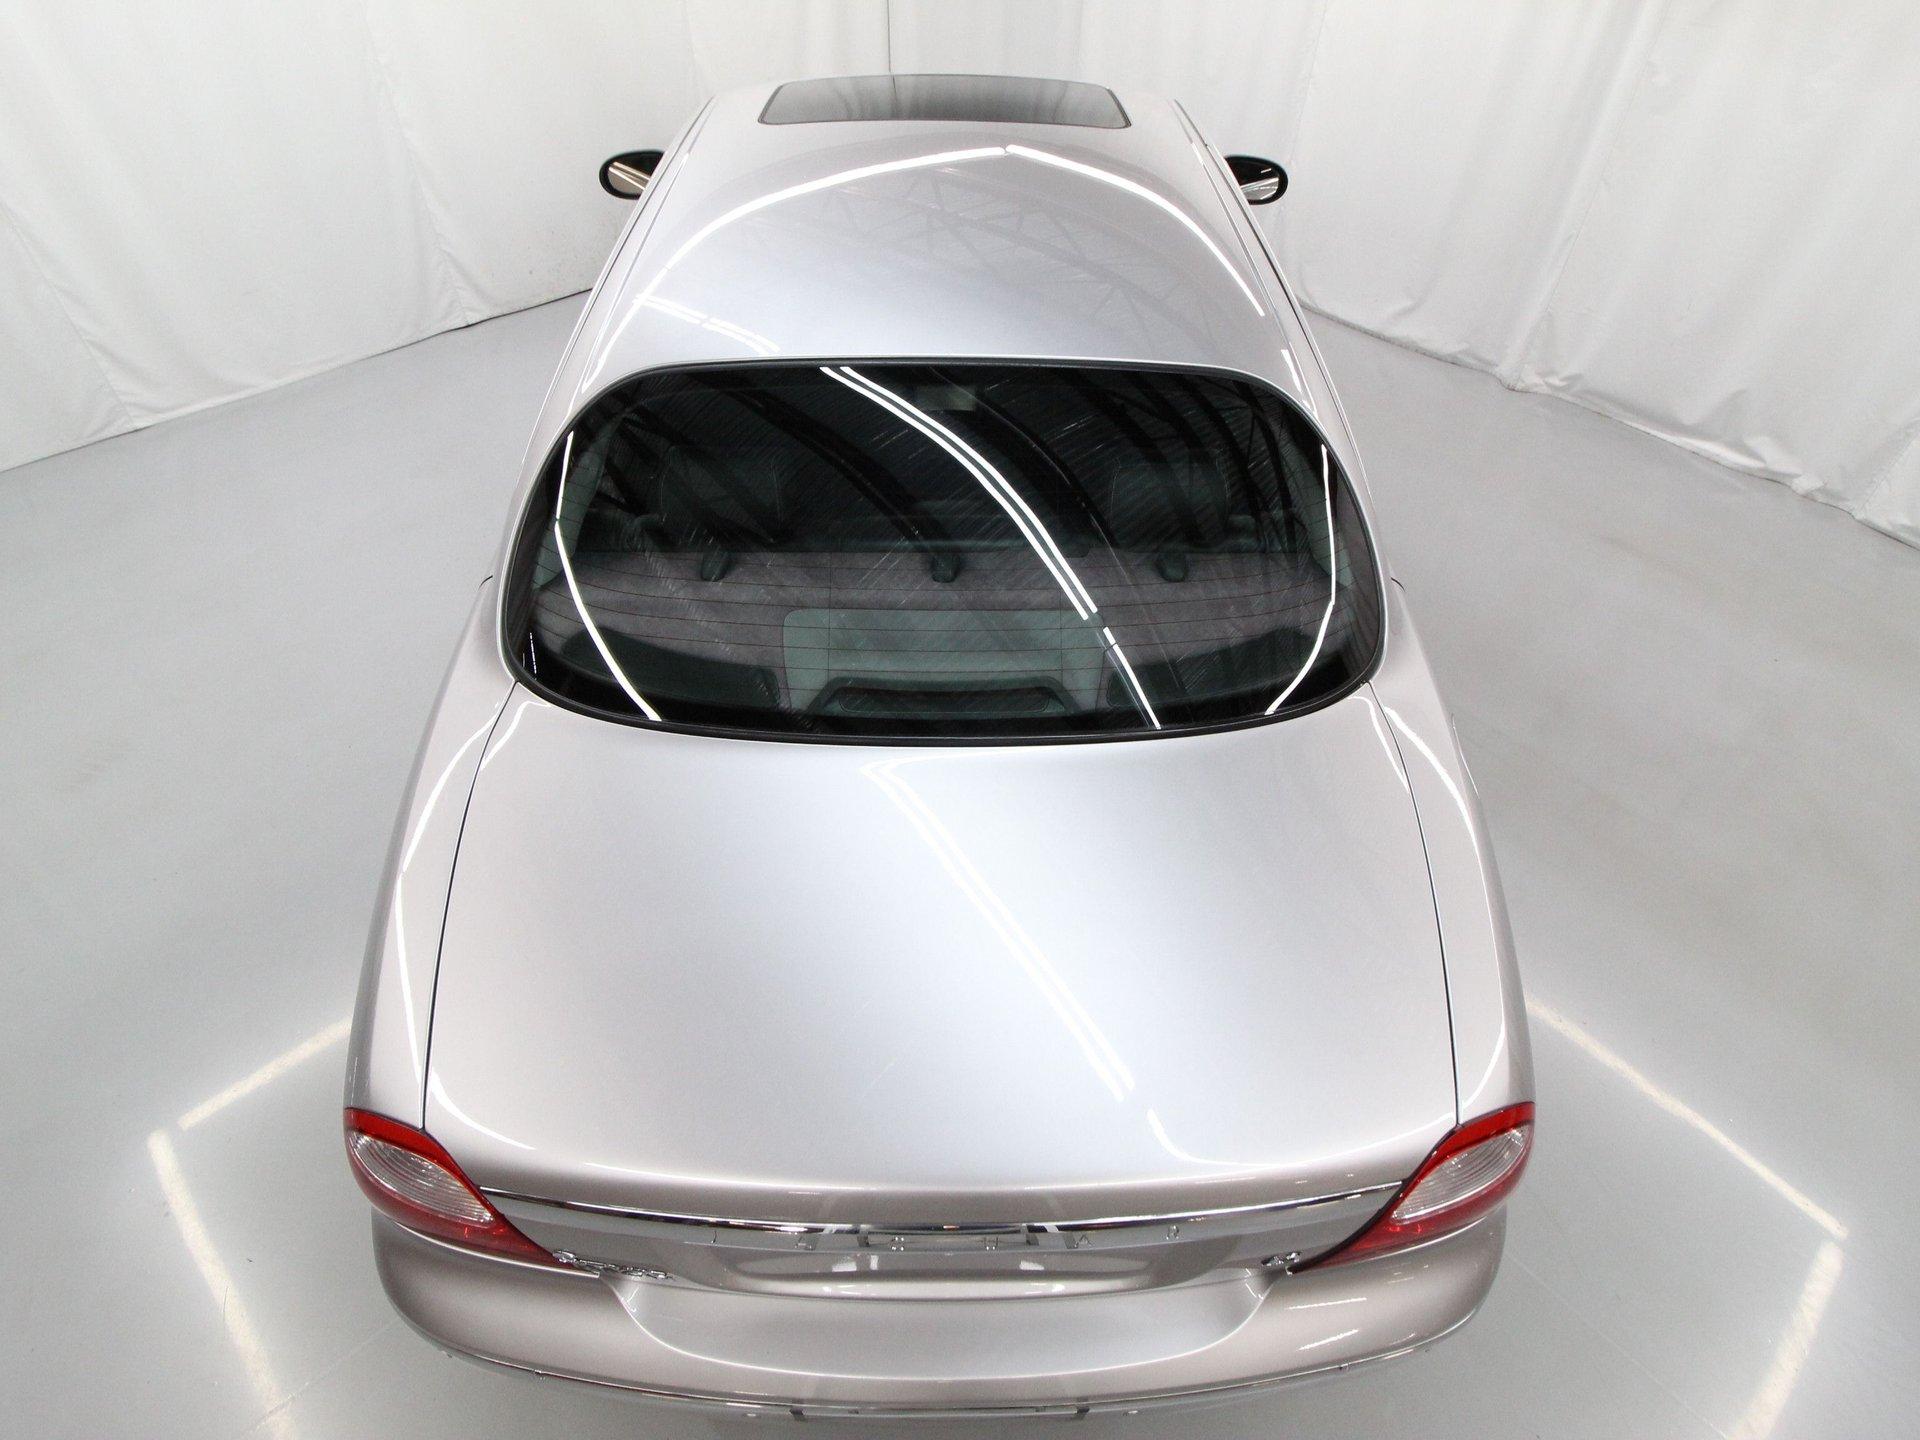 2005 Jaguar S-Type